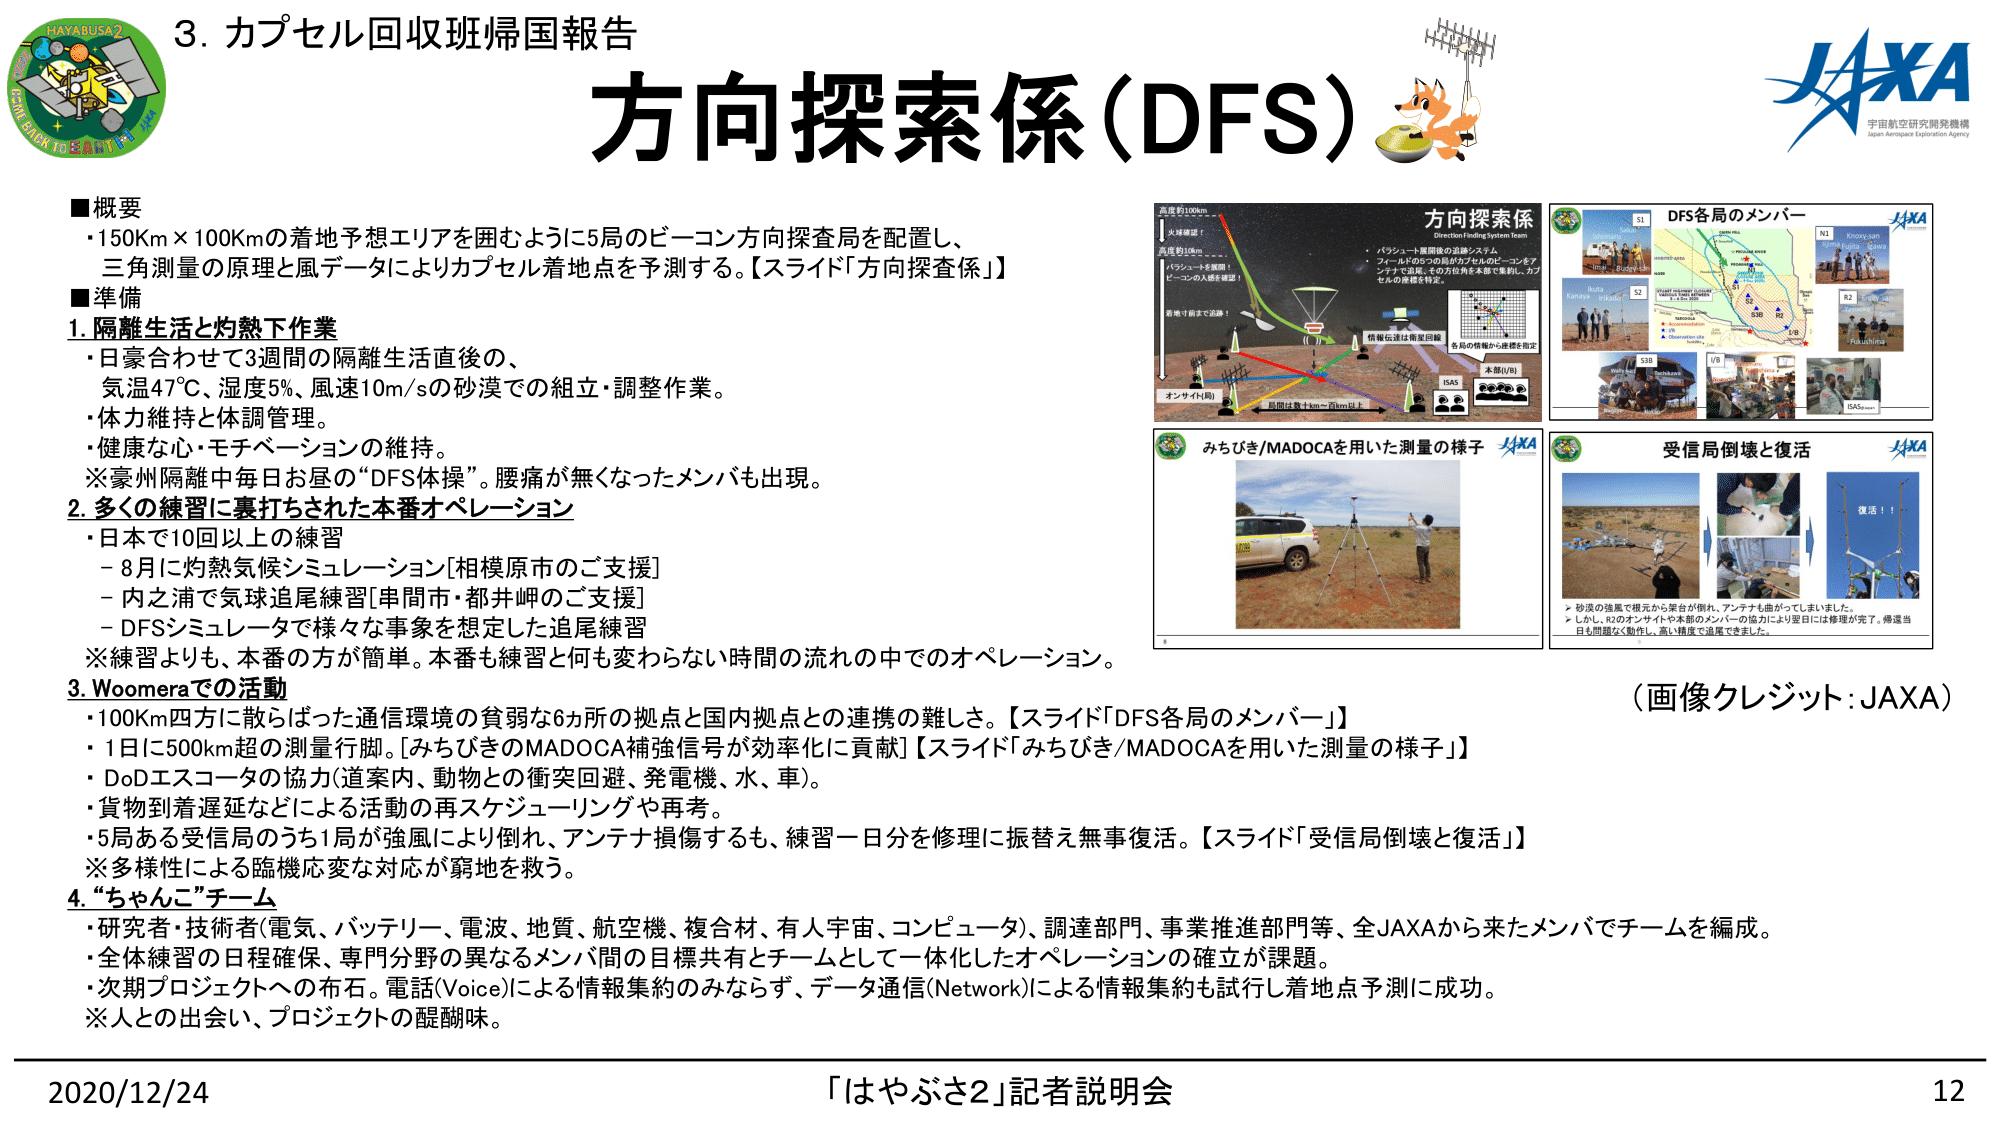 f:id:Imamura:20201224135106p:plain